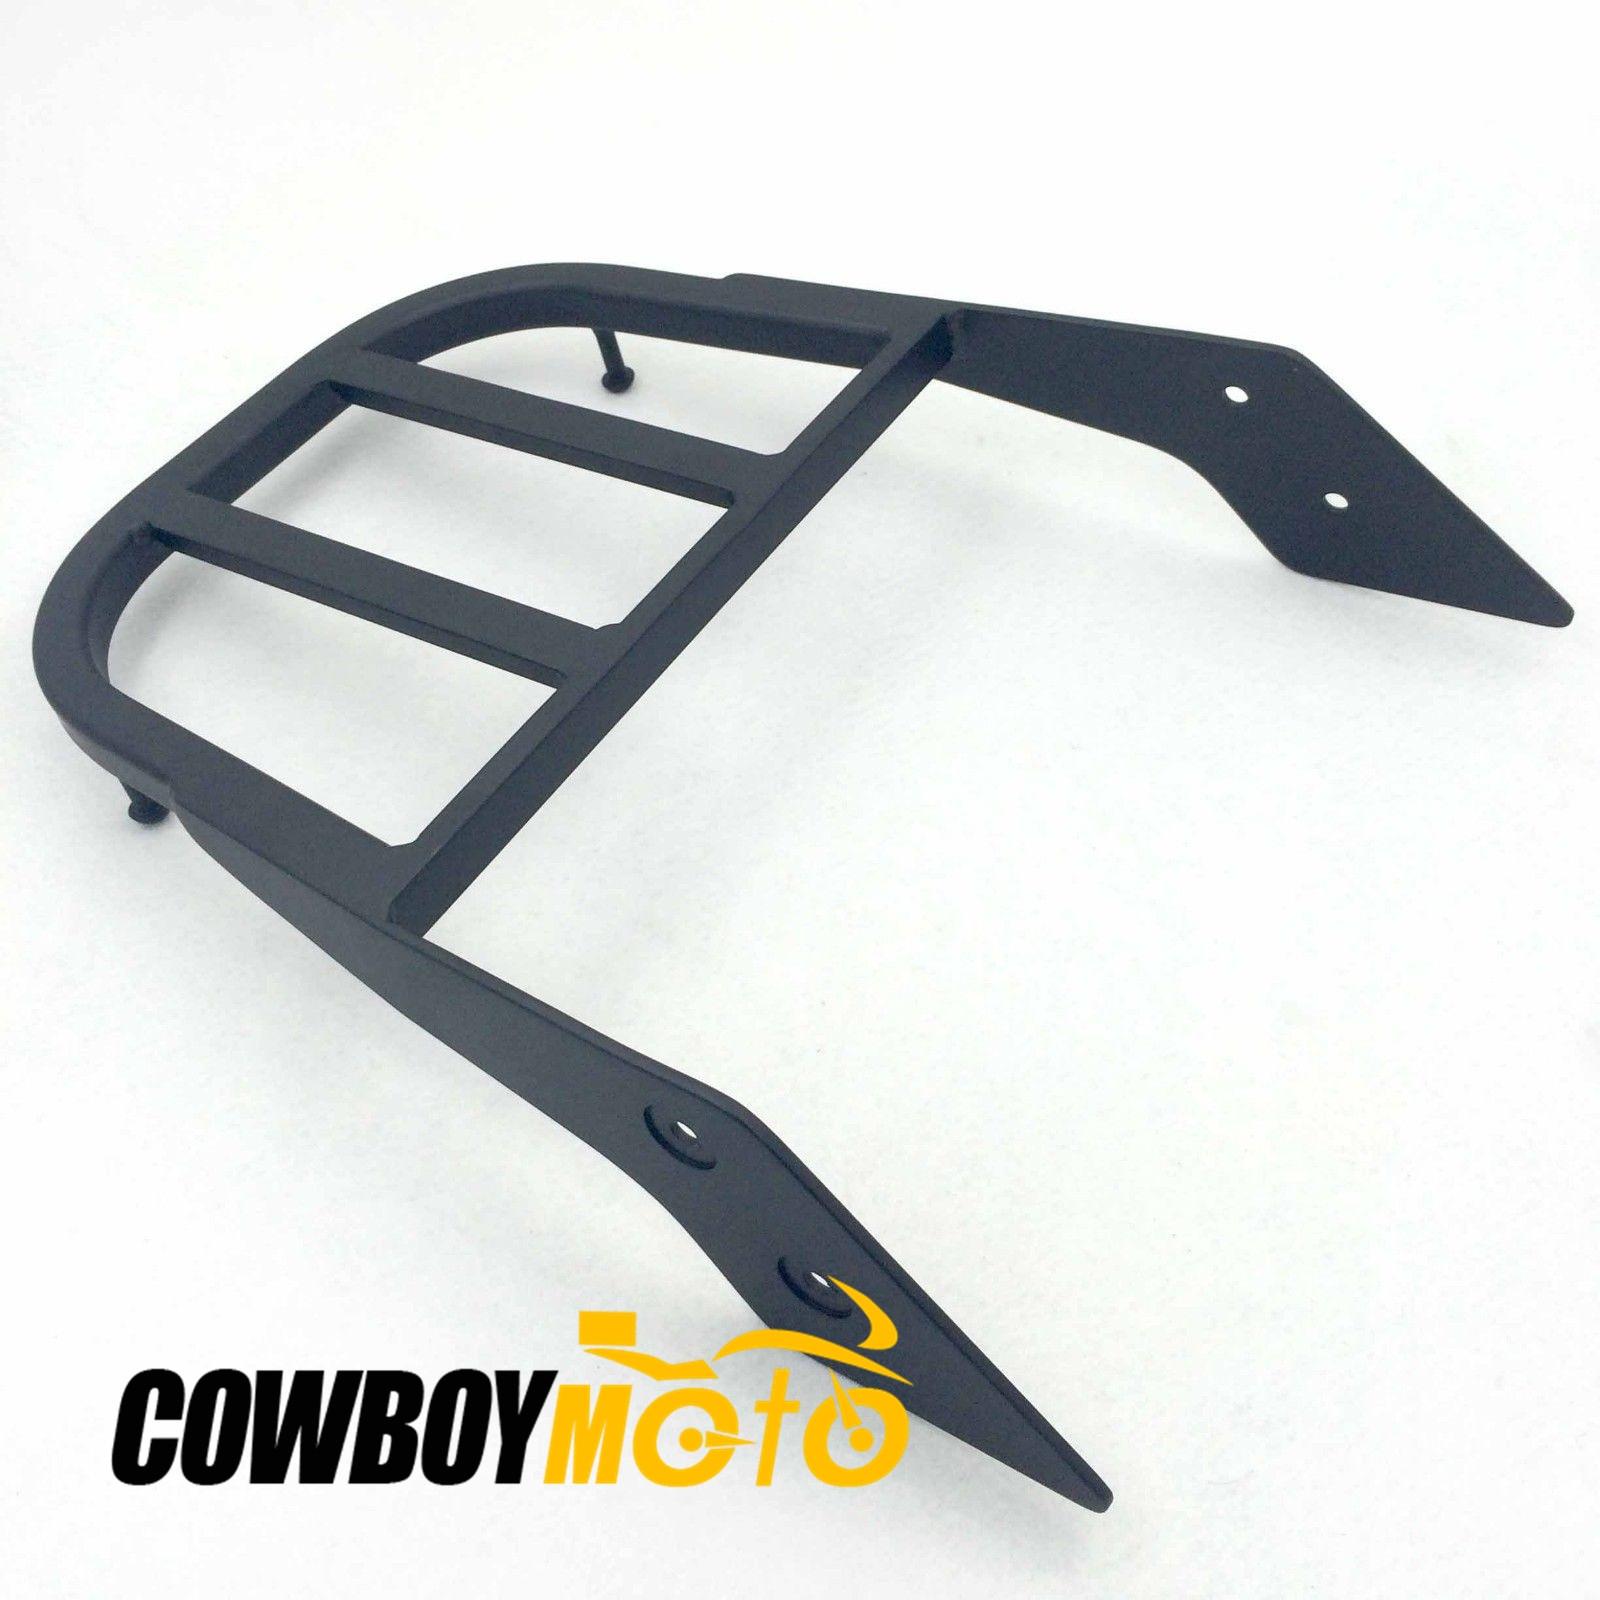 49.69$  Buy here - http://aliqqx.worldwells.pw/go.php?t=32685840145 - Motorcycle Chrome Sissy Bar Luggage Rack For Honda VTX VTX 1300N / R / S VTX 1800N / R / S 49.69$